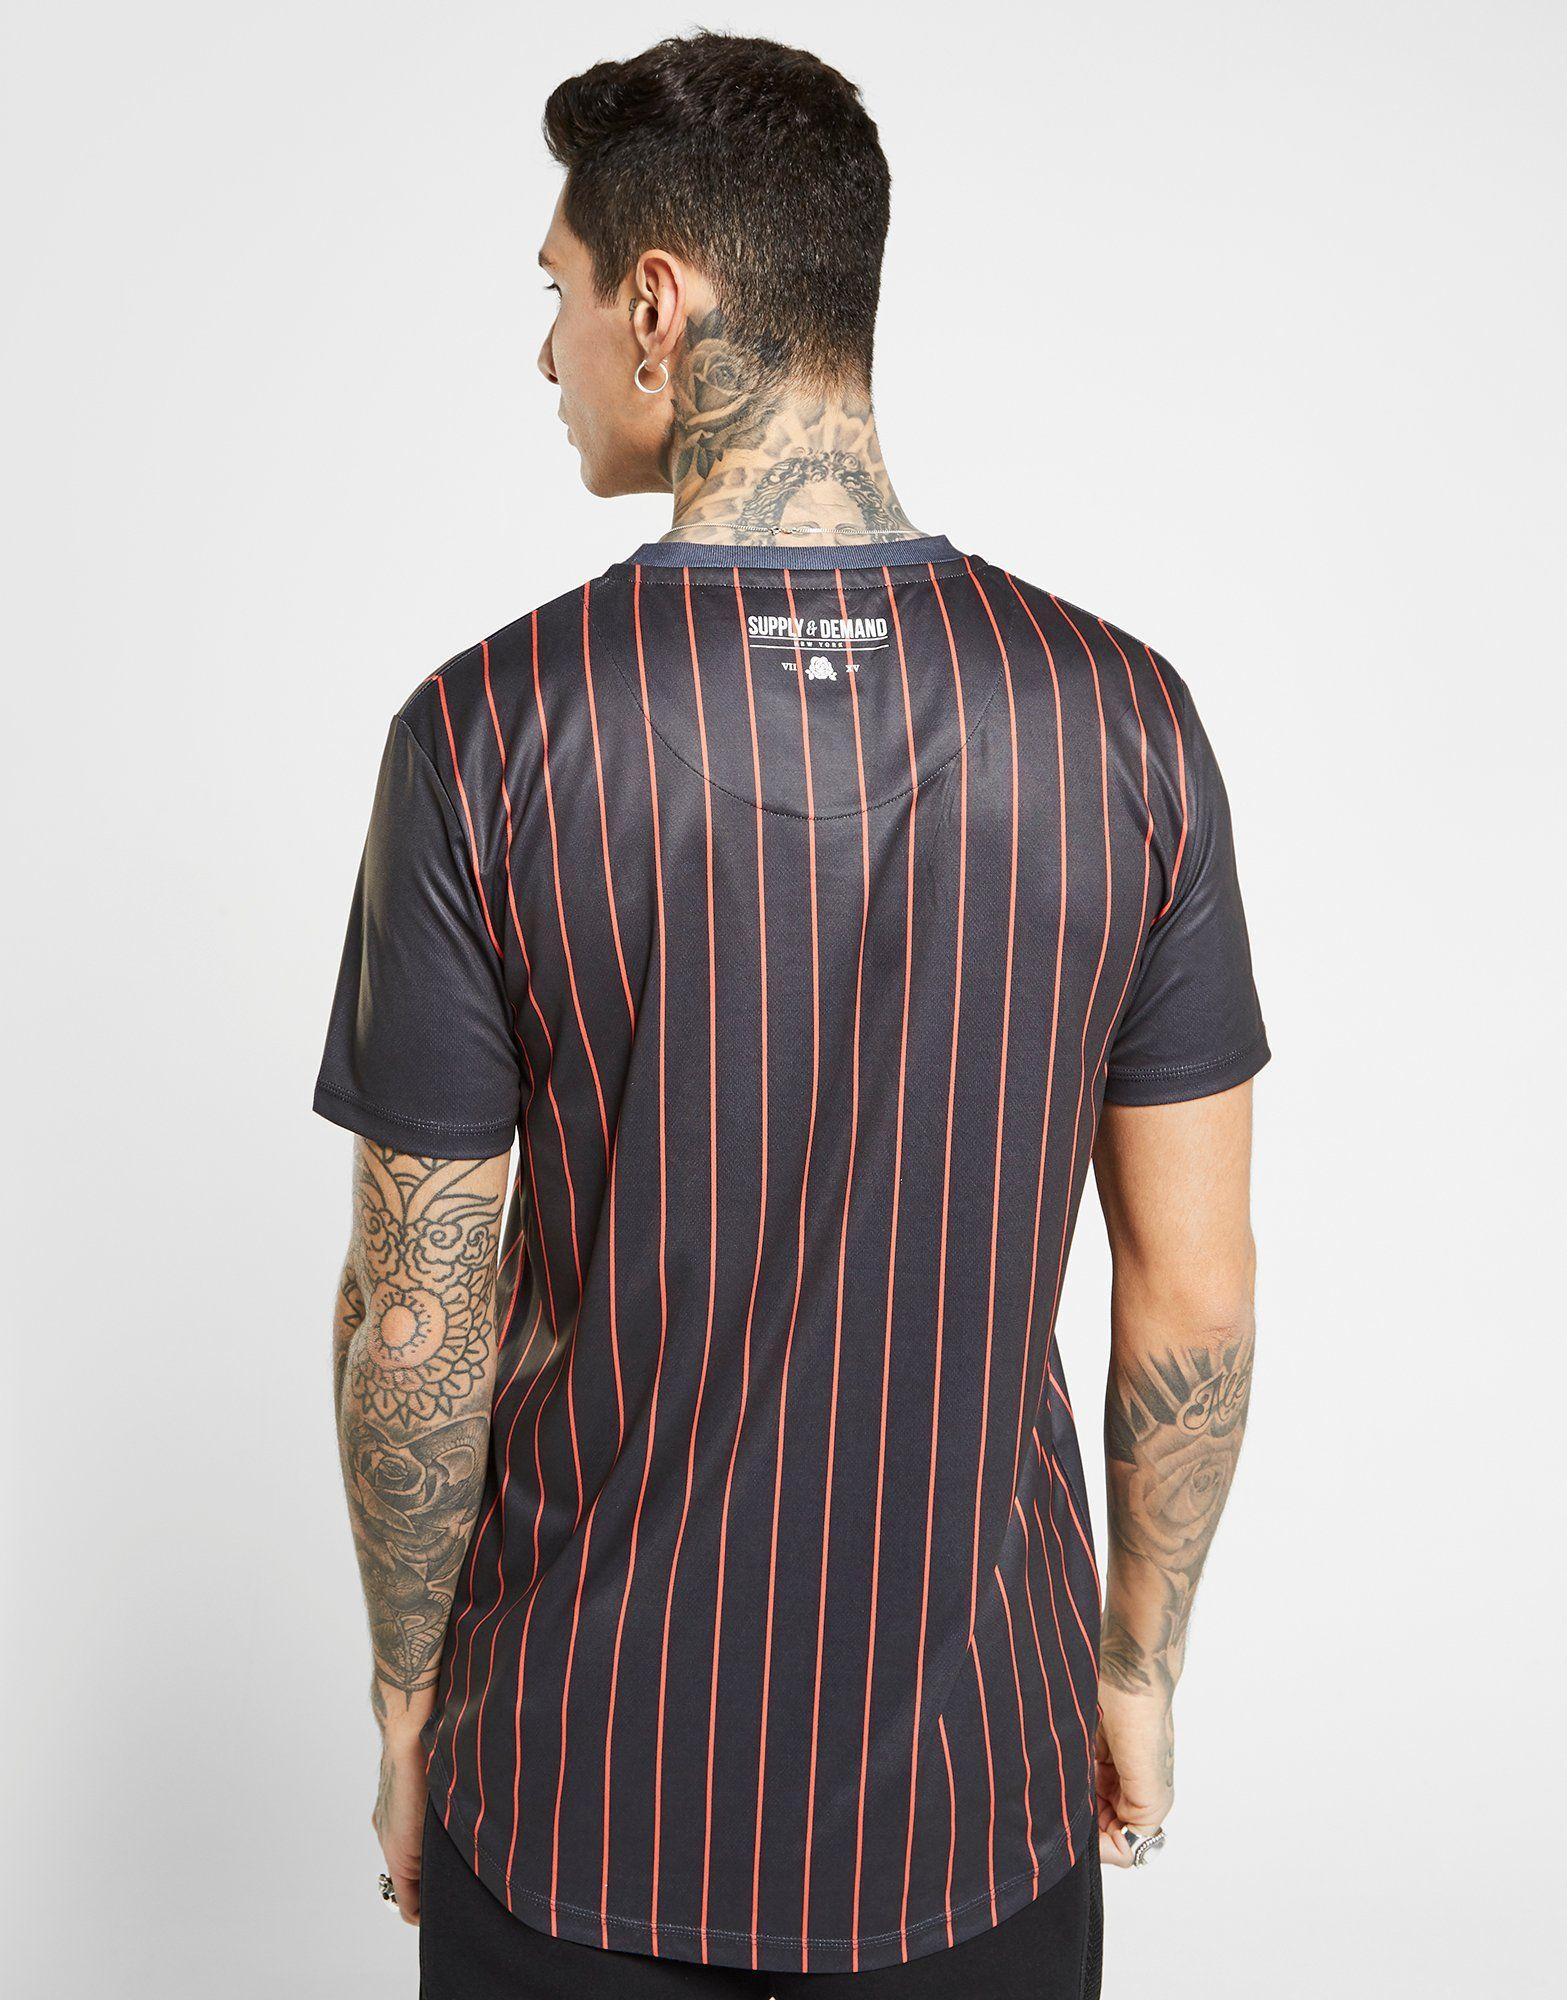 Supply & Demand Bowling T-Shirt